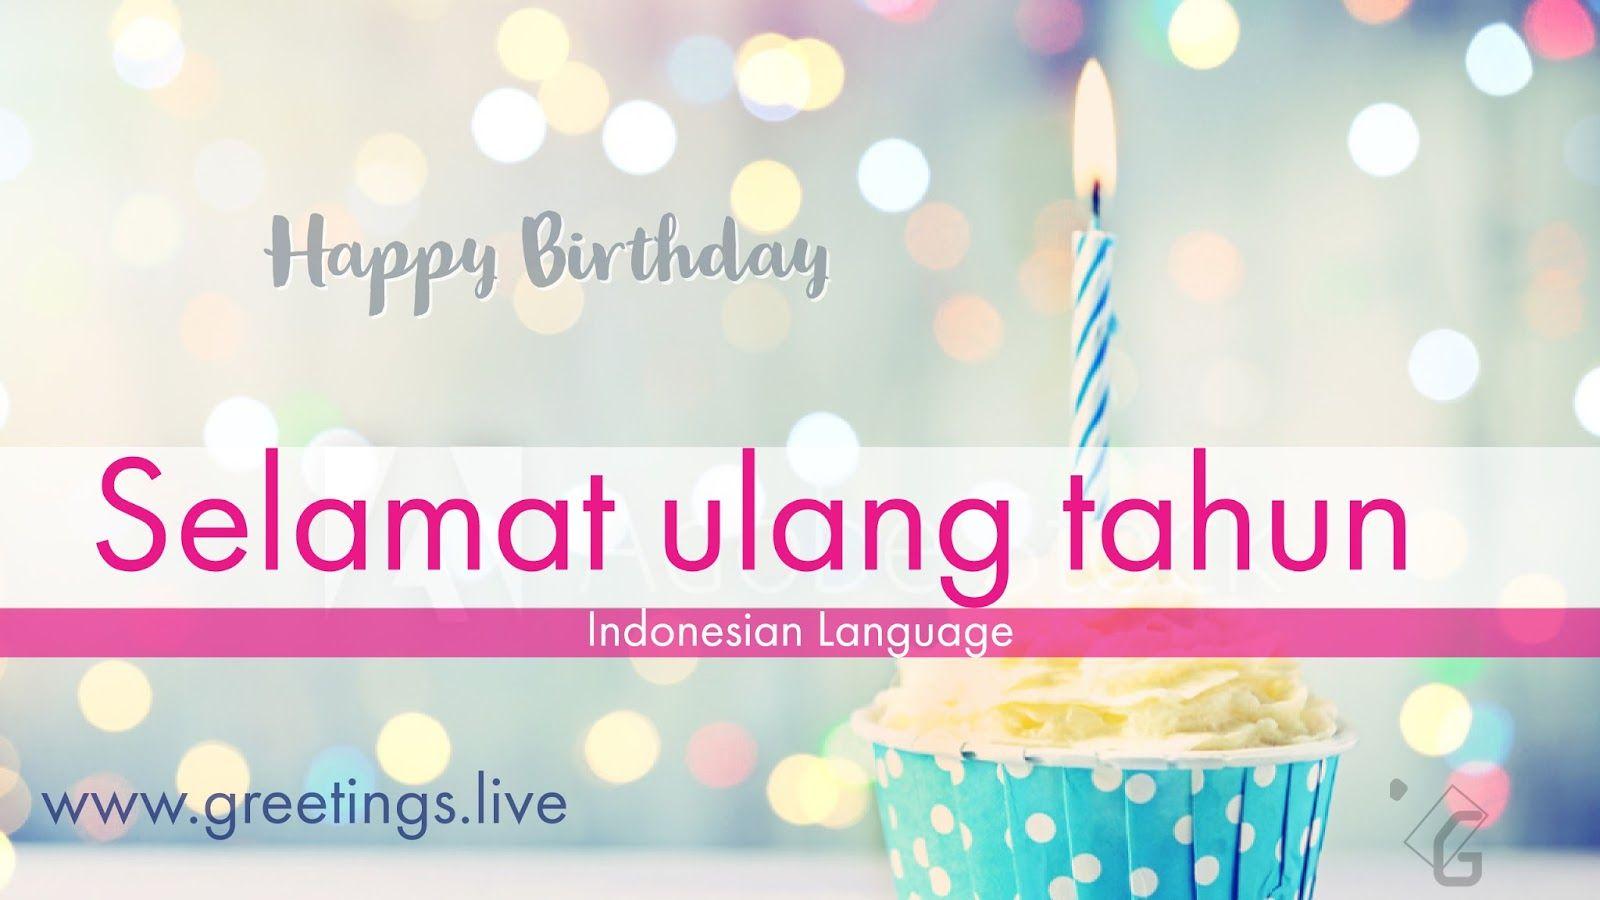 Happy birthday in Indonesian Language HD Birthday wishes